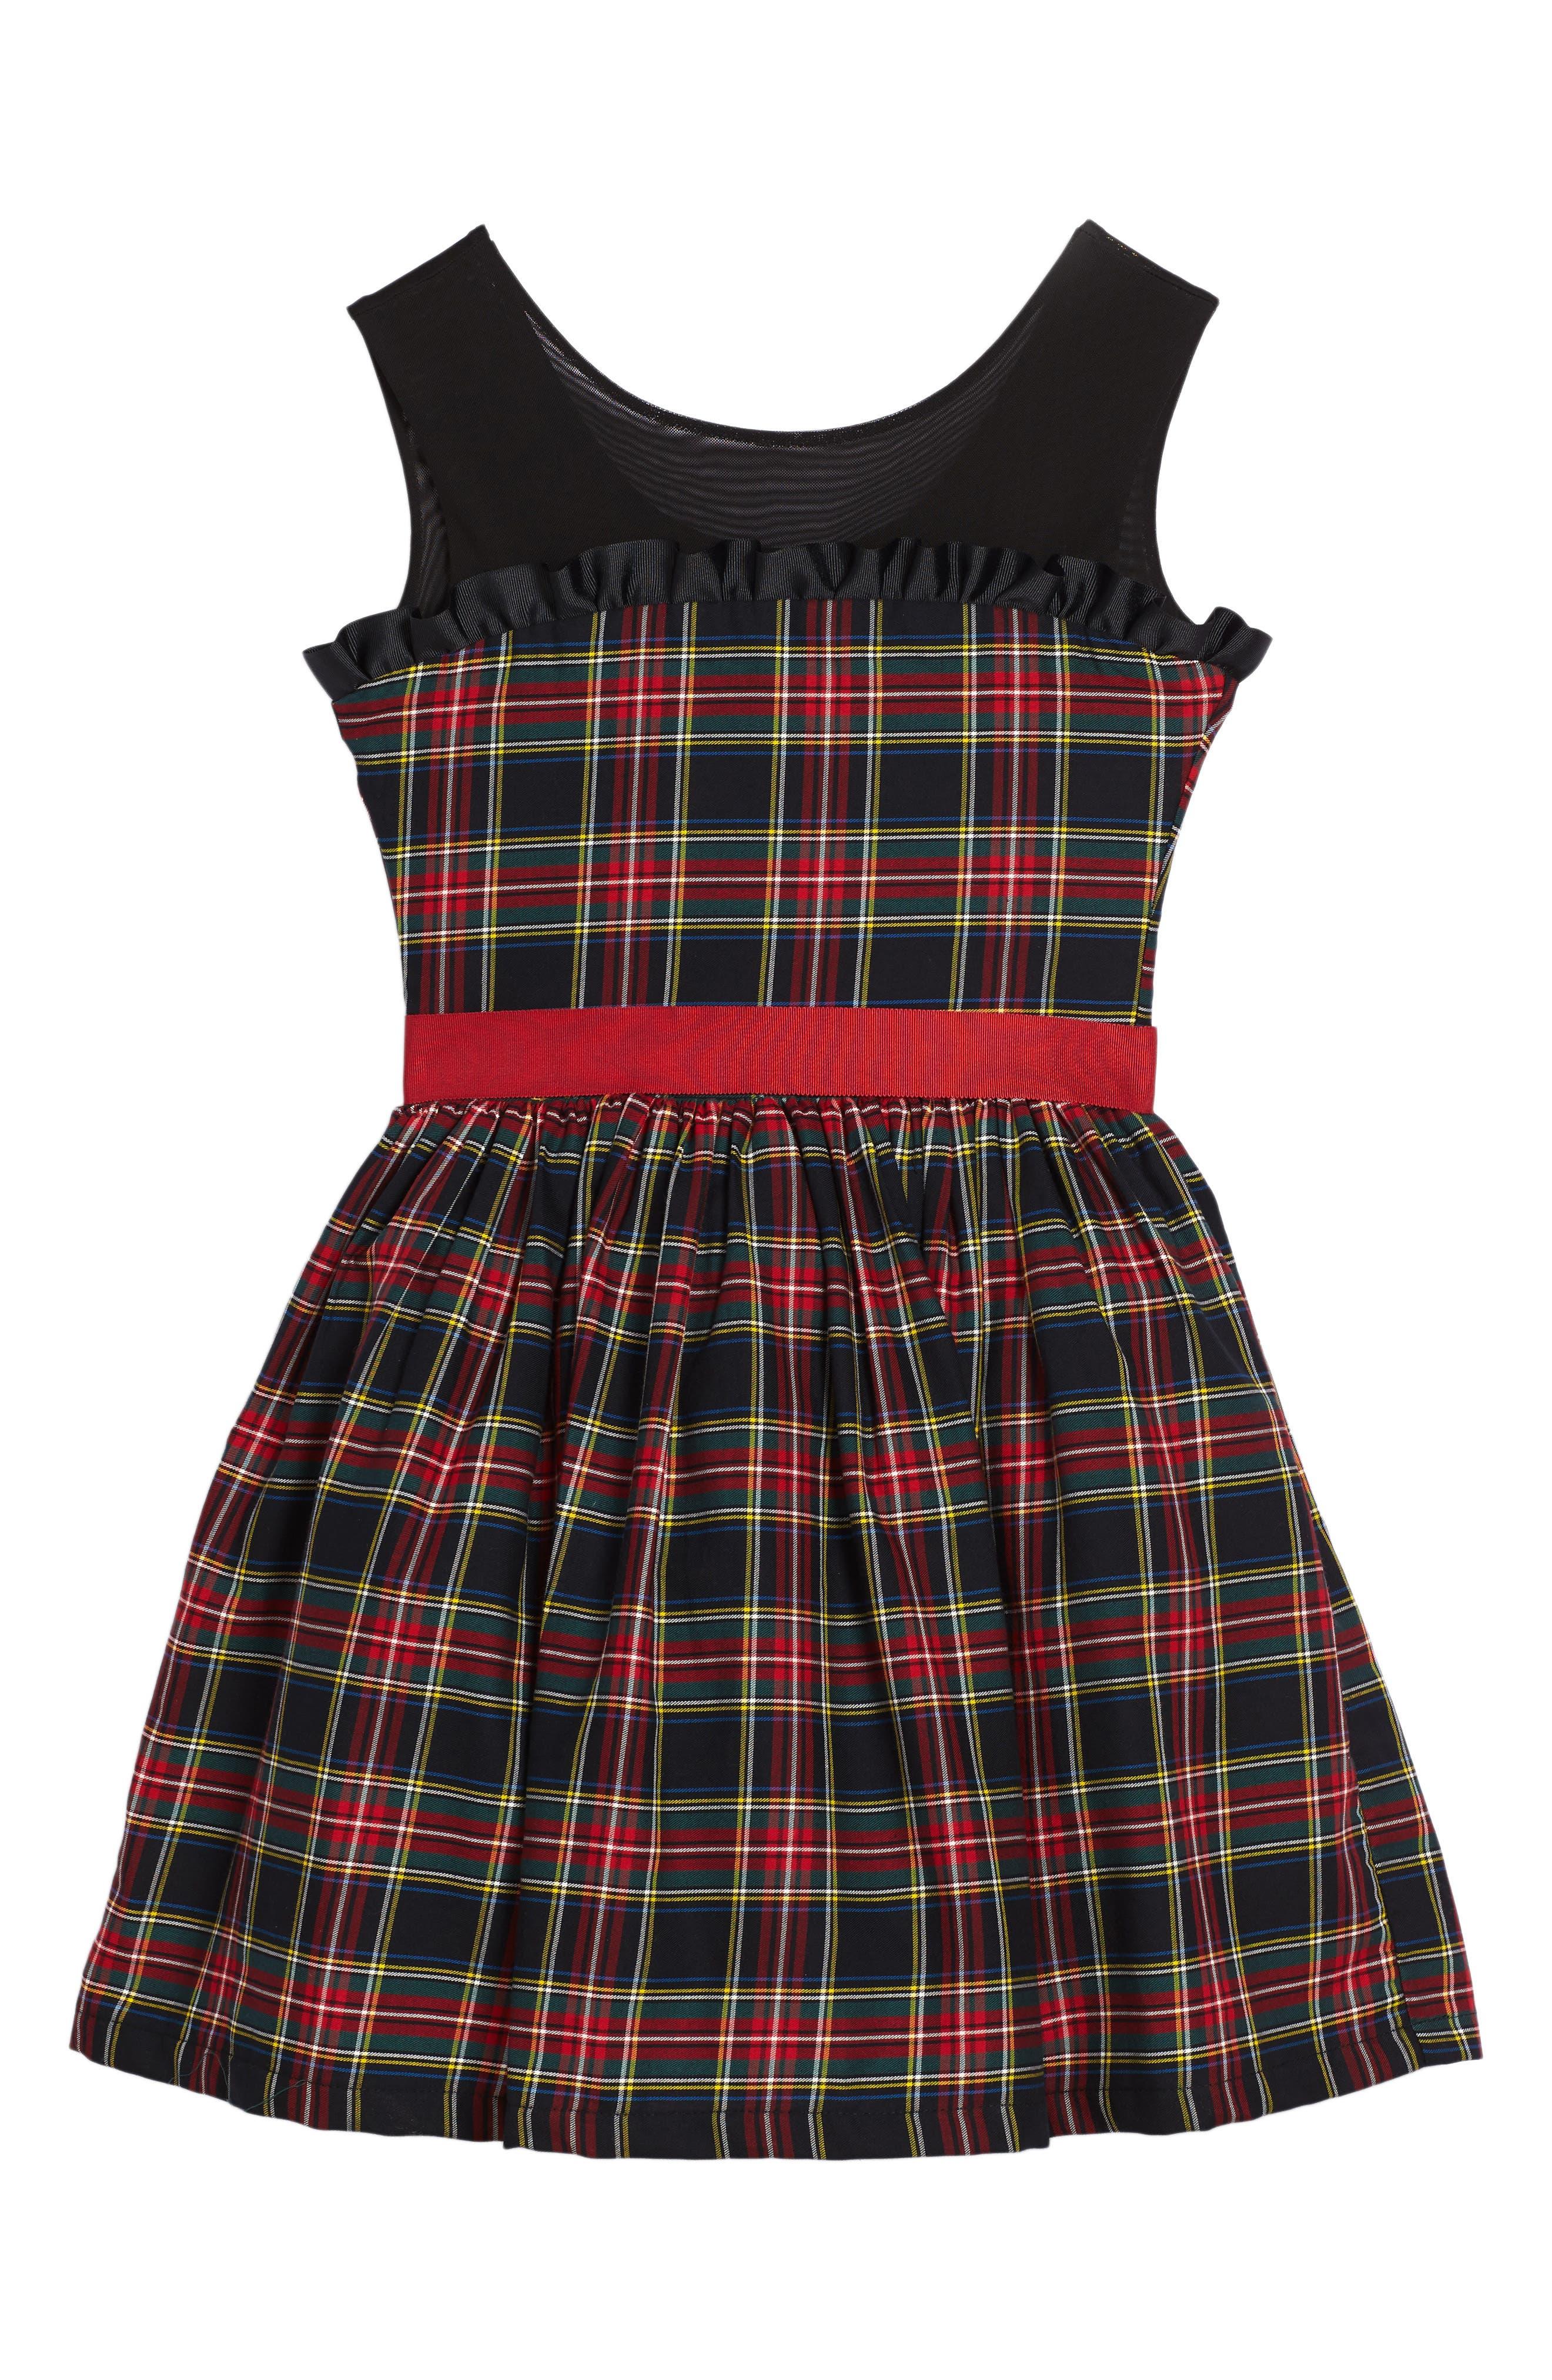 Main Image - Fiveloaves Twofish Winter Tartan Party Dress (Big Girls)